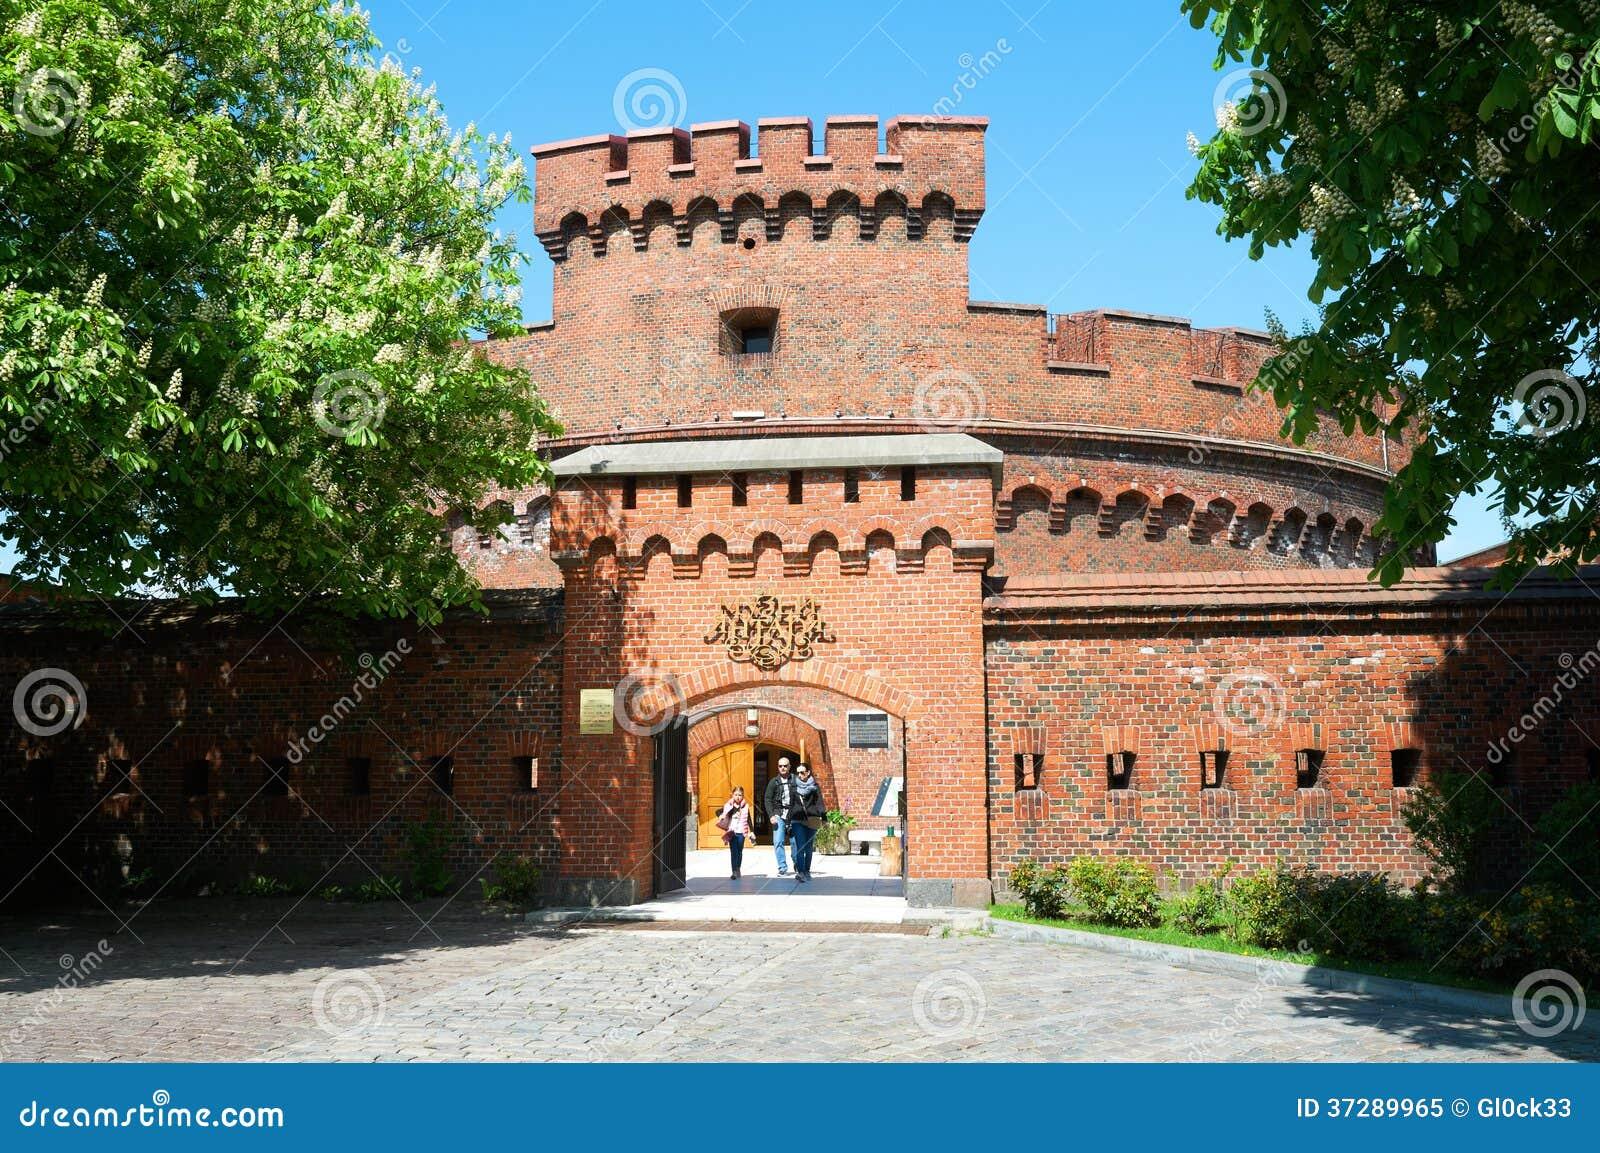 Kaliningrad, Amber Museum: description, history, expositions and reviews 74